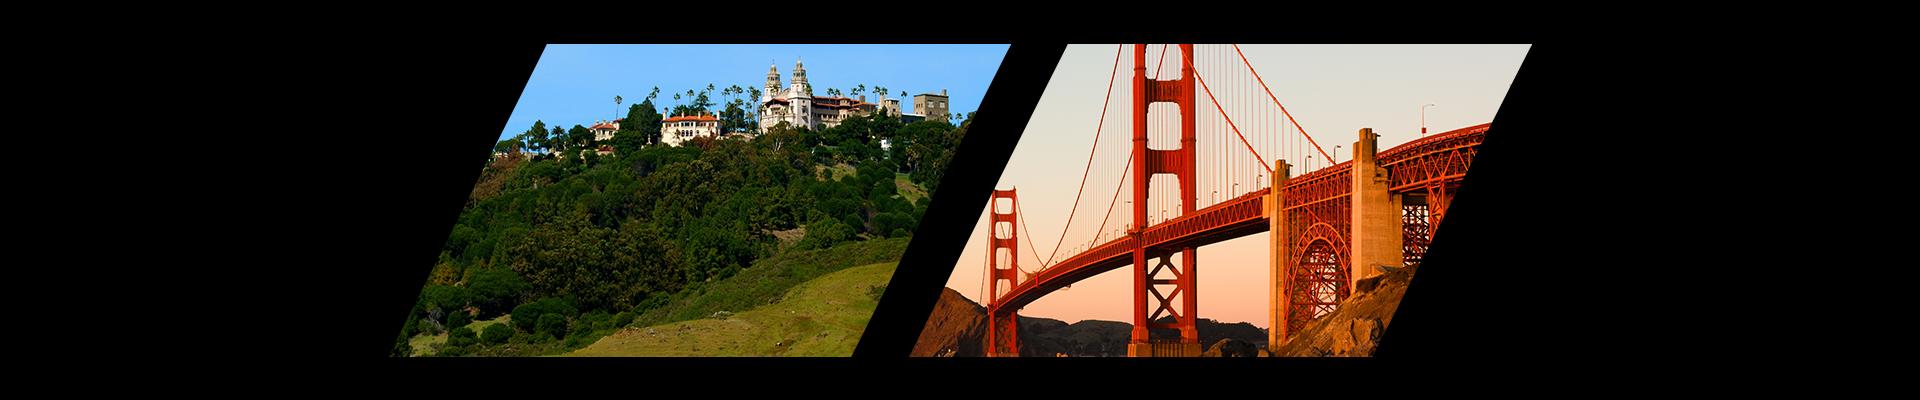 Hearst Castle and the Golden Gate Bridge in California